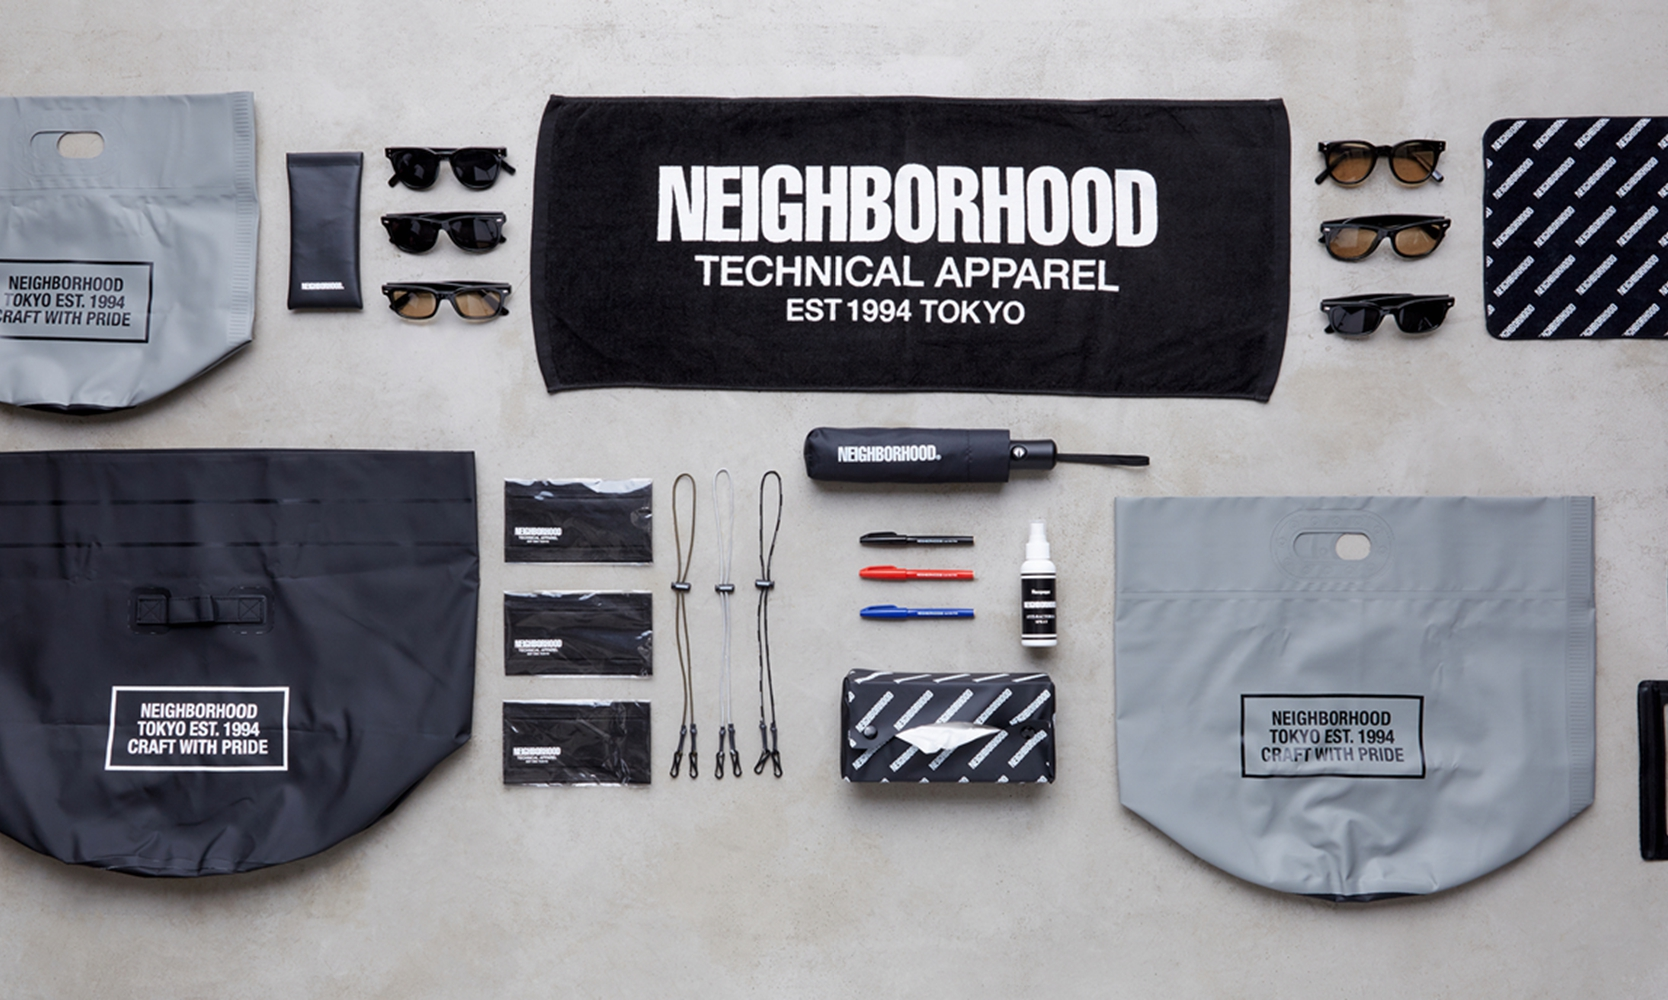 NEIGHBORHOOD 推出全新「NBHD BOOKSTORE」生活周边系列